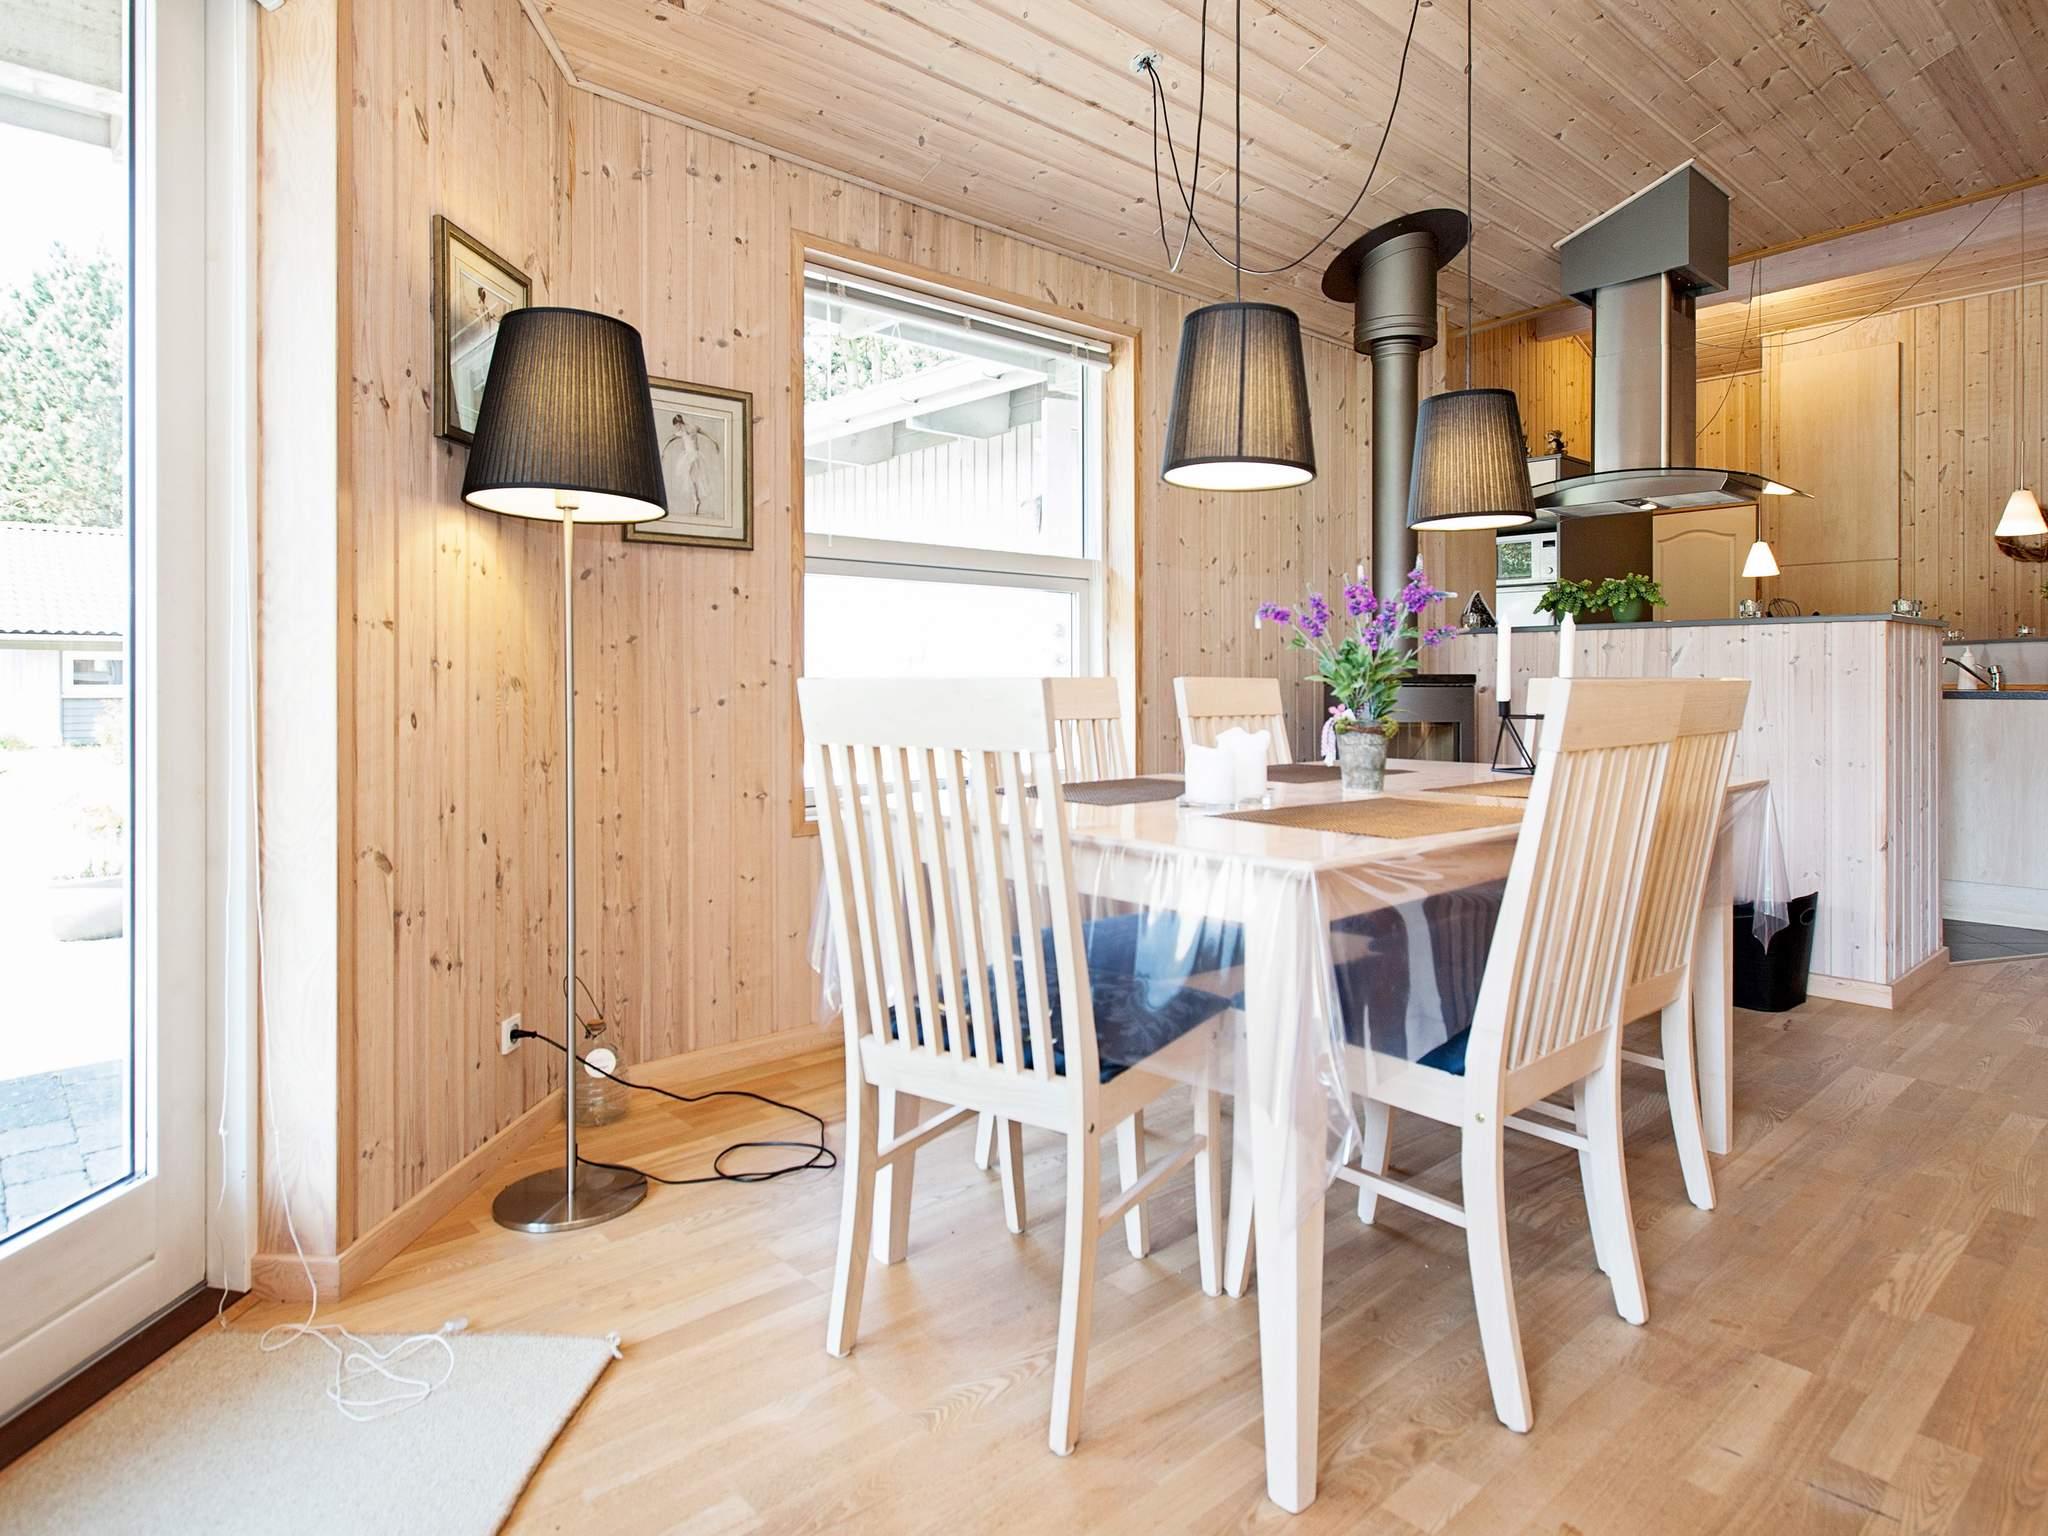 Ferienhaus Hyldtofte Østersøbad (93262), Hyldtofte Fæland, , Lolland, Dänemark, Bild 7